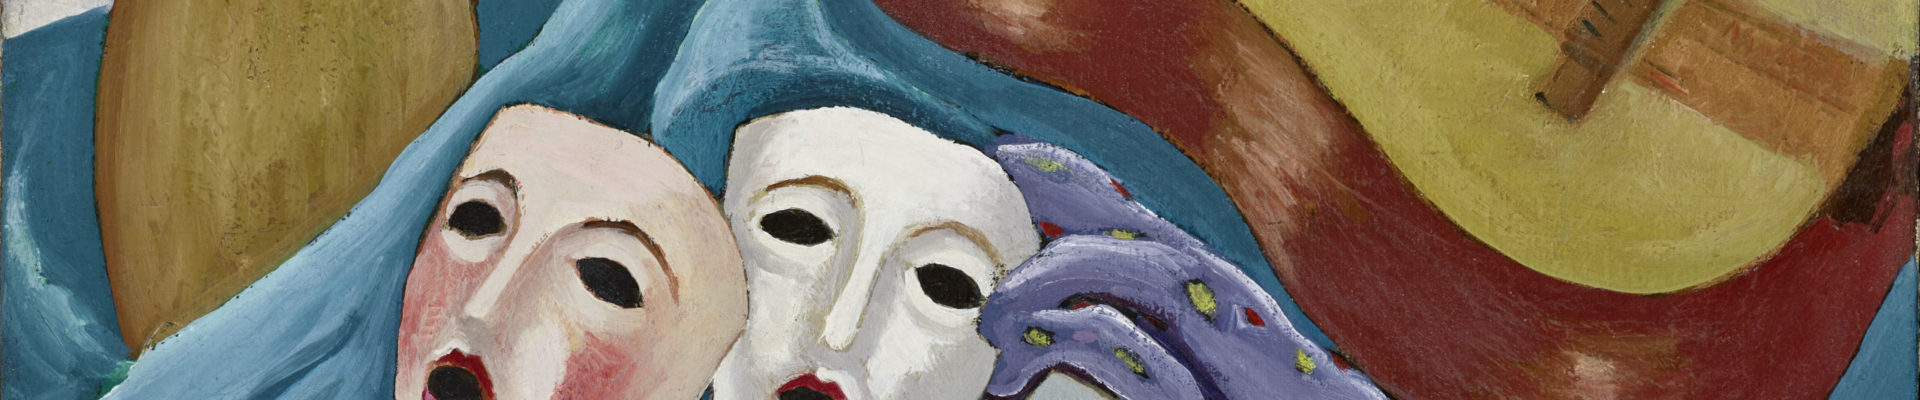 Frandsen Naturte morte aux Masques 1925